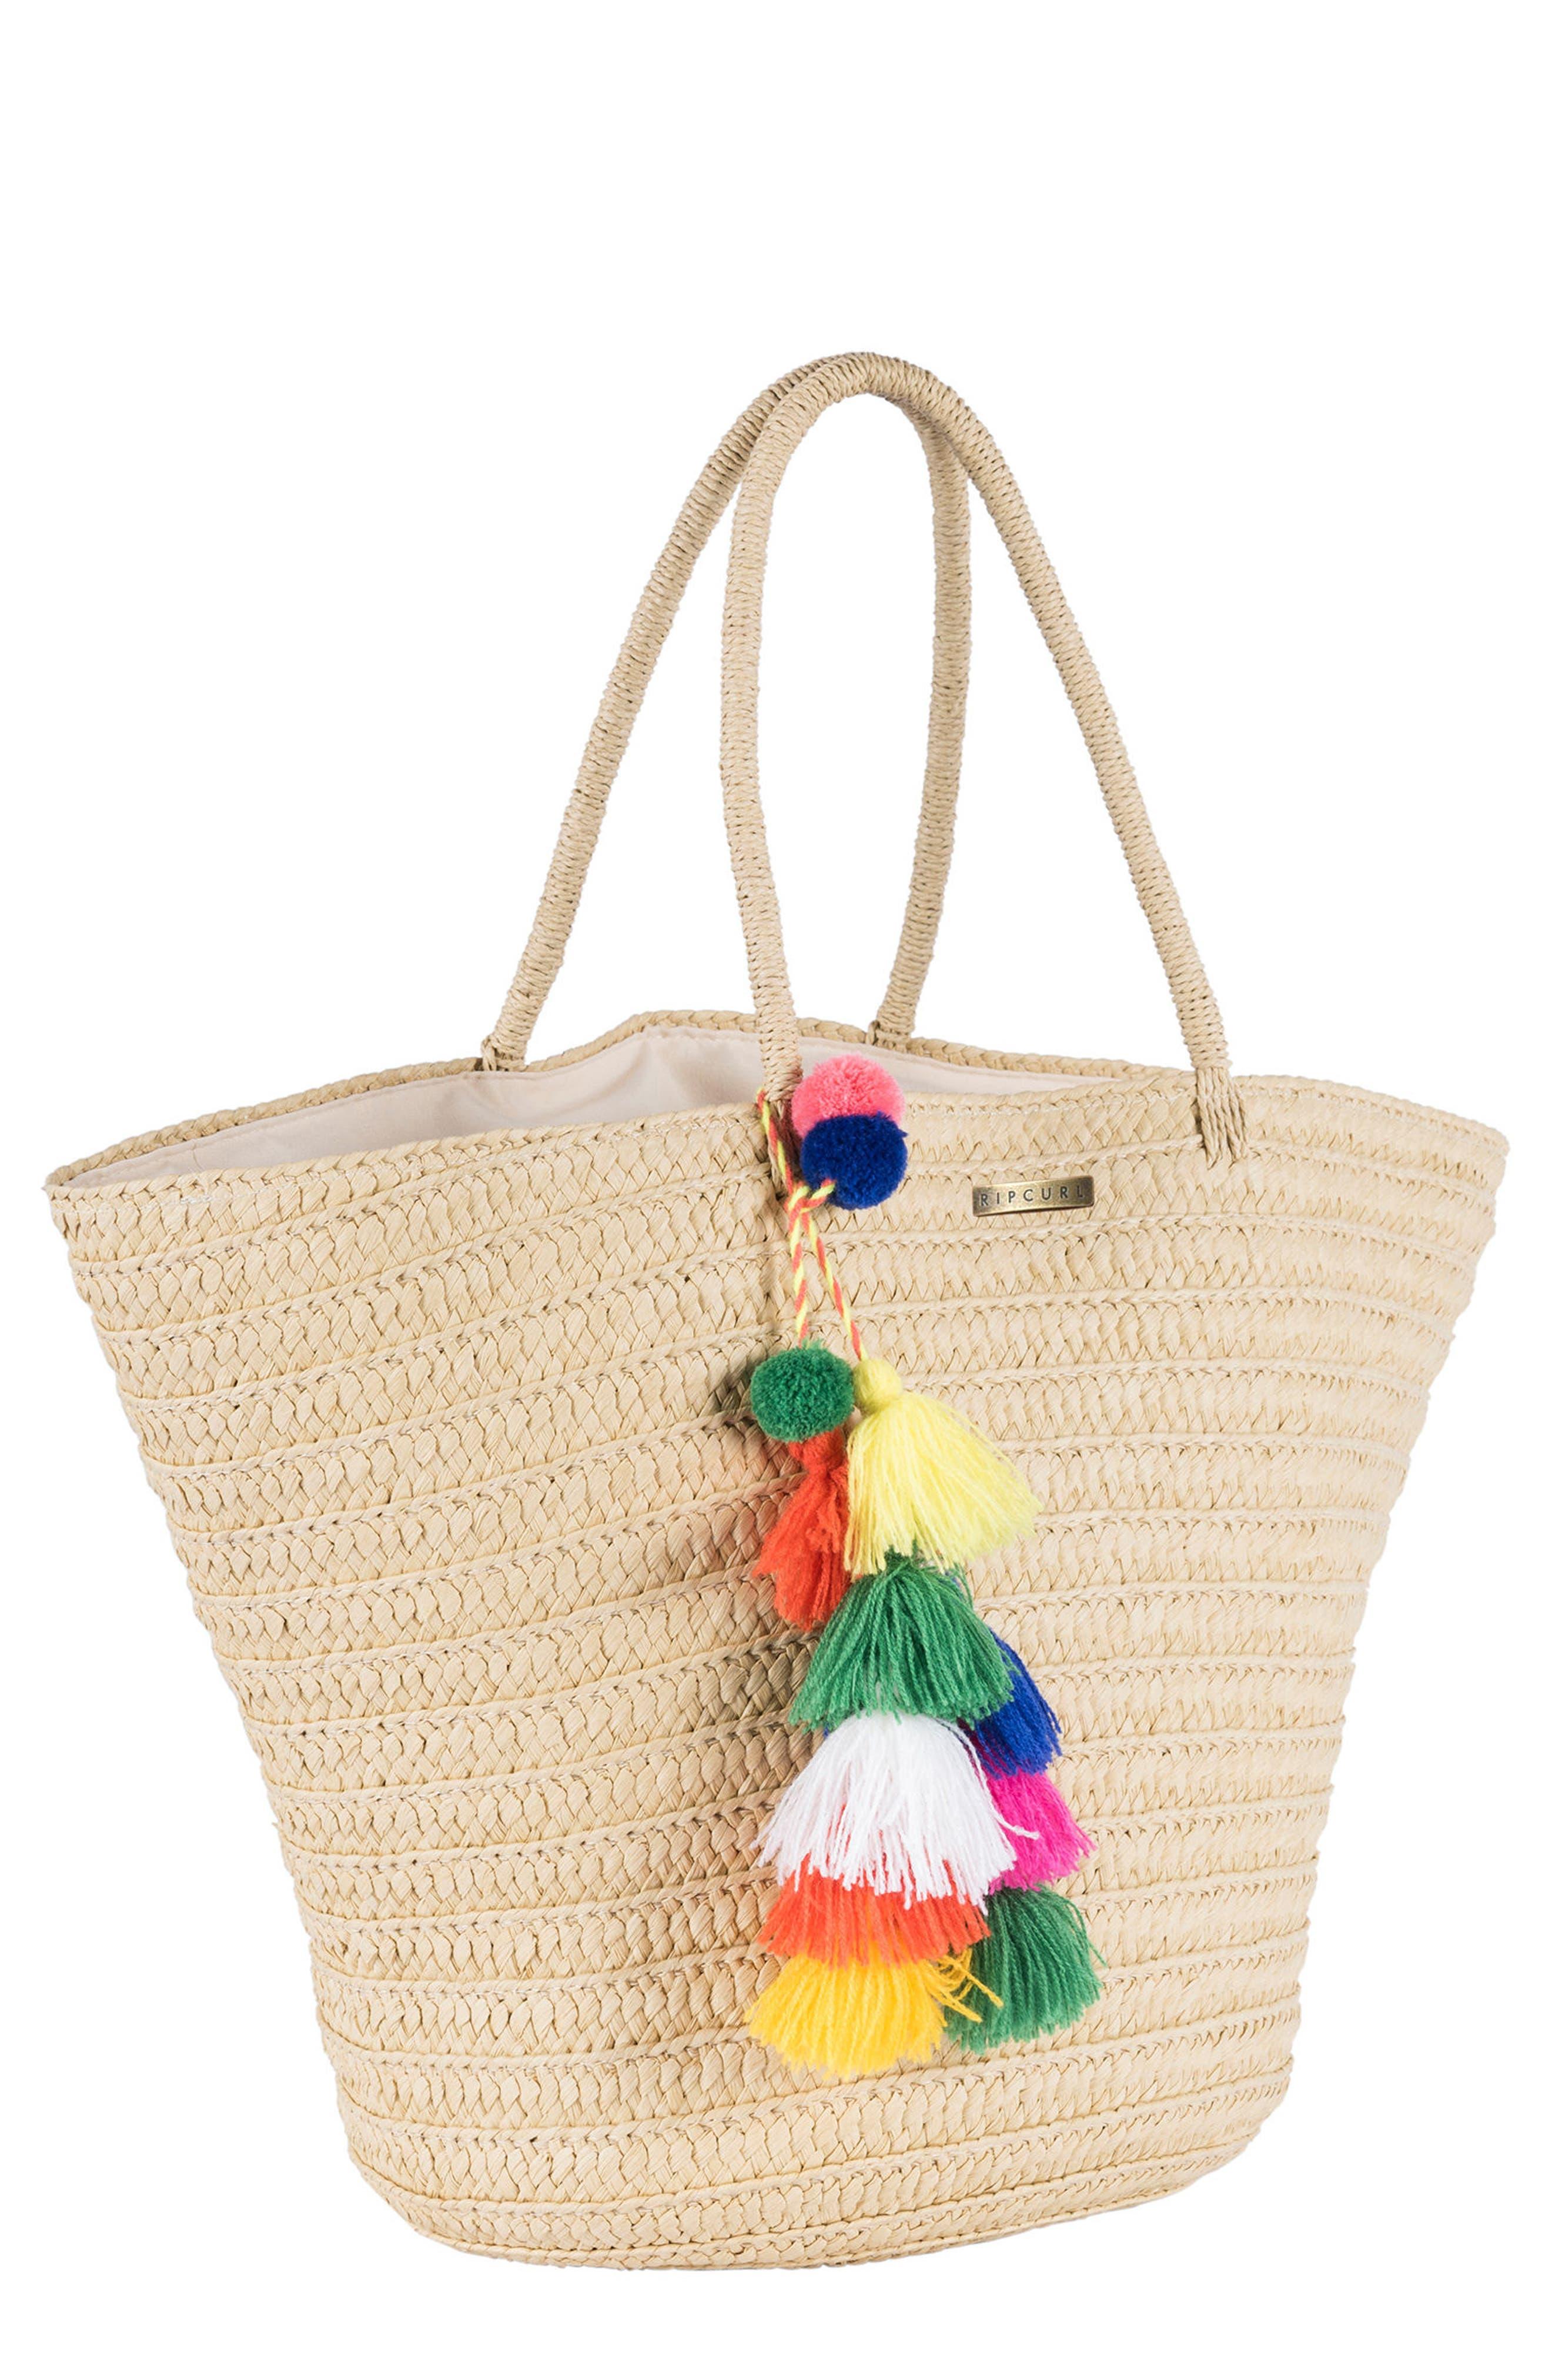 Beach Bazaar Straw Bag,                         Main,                         color, Natural